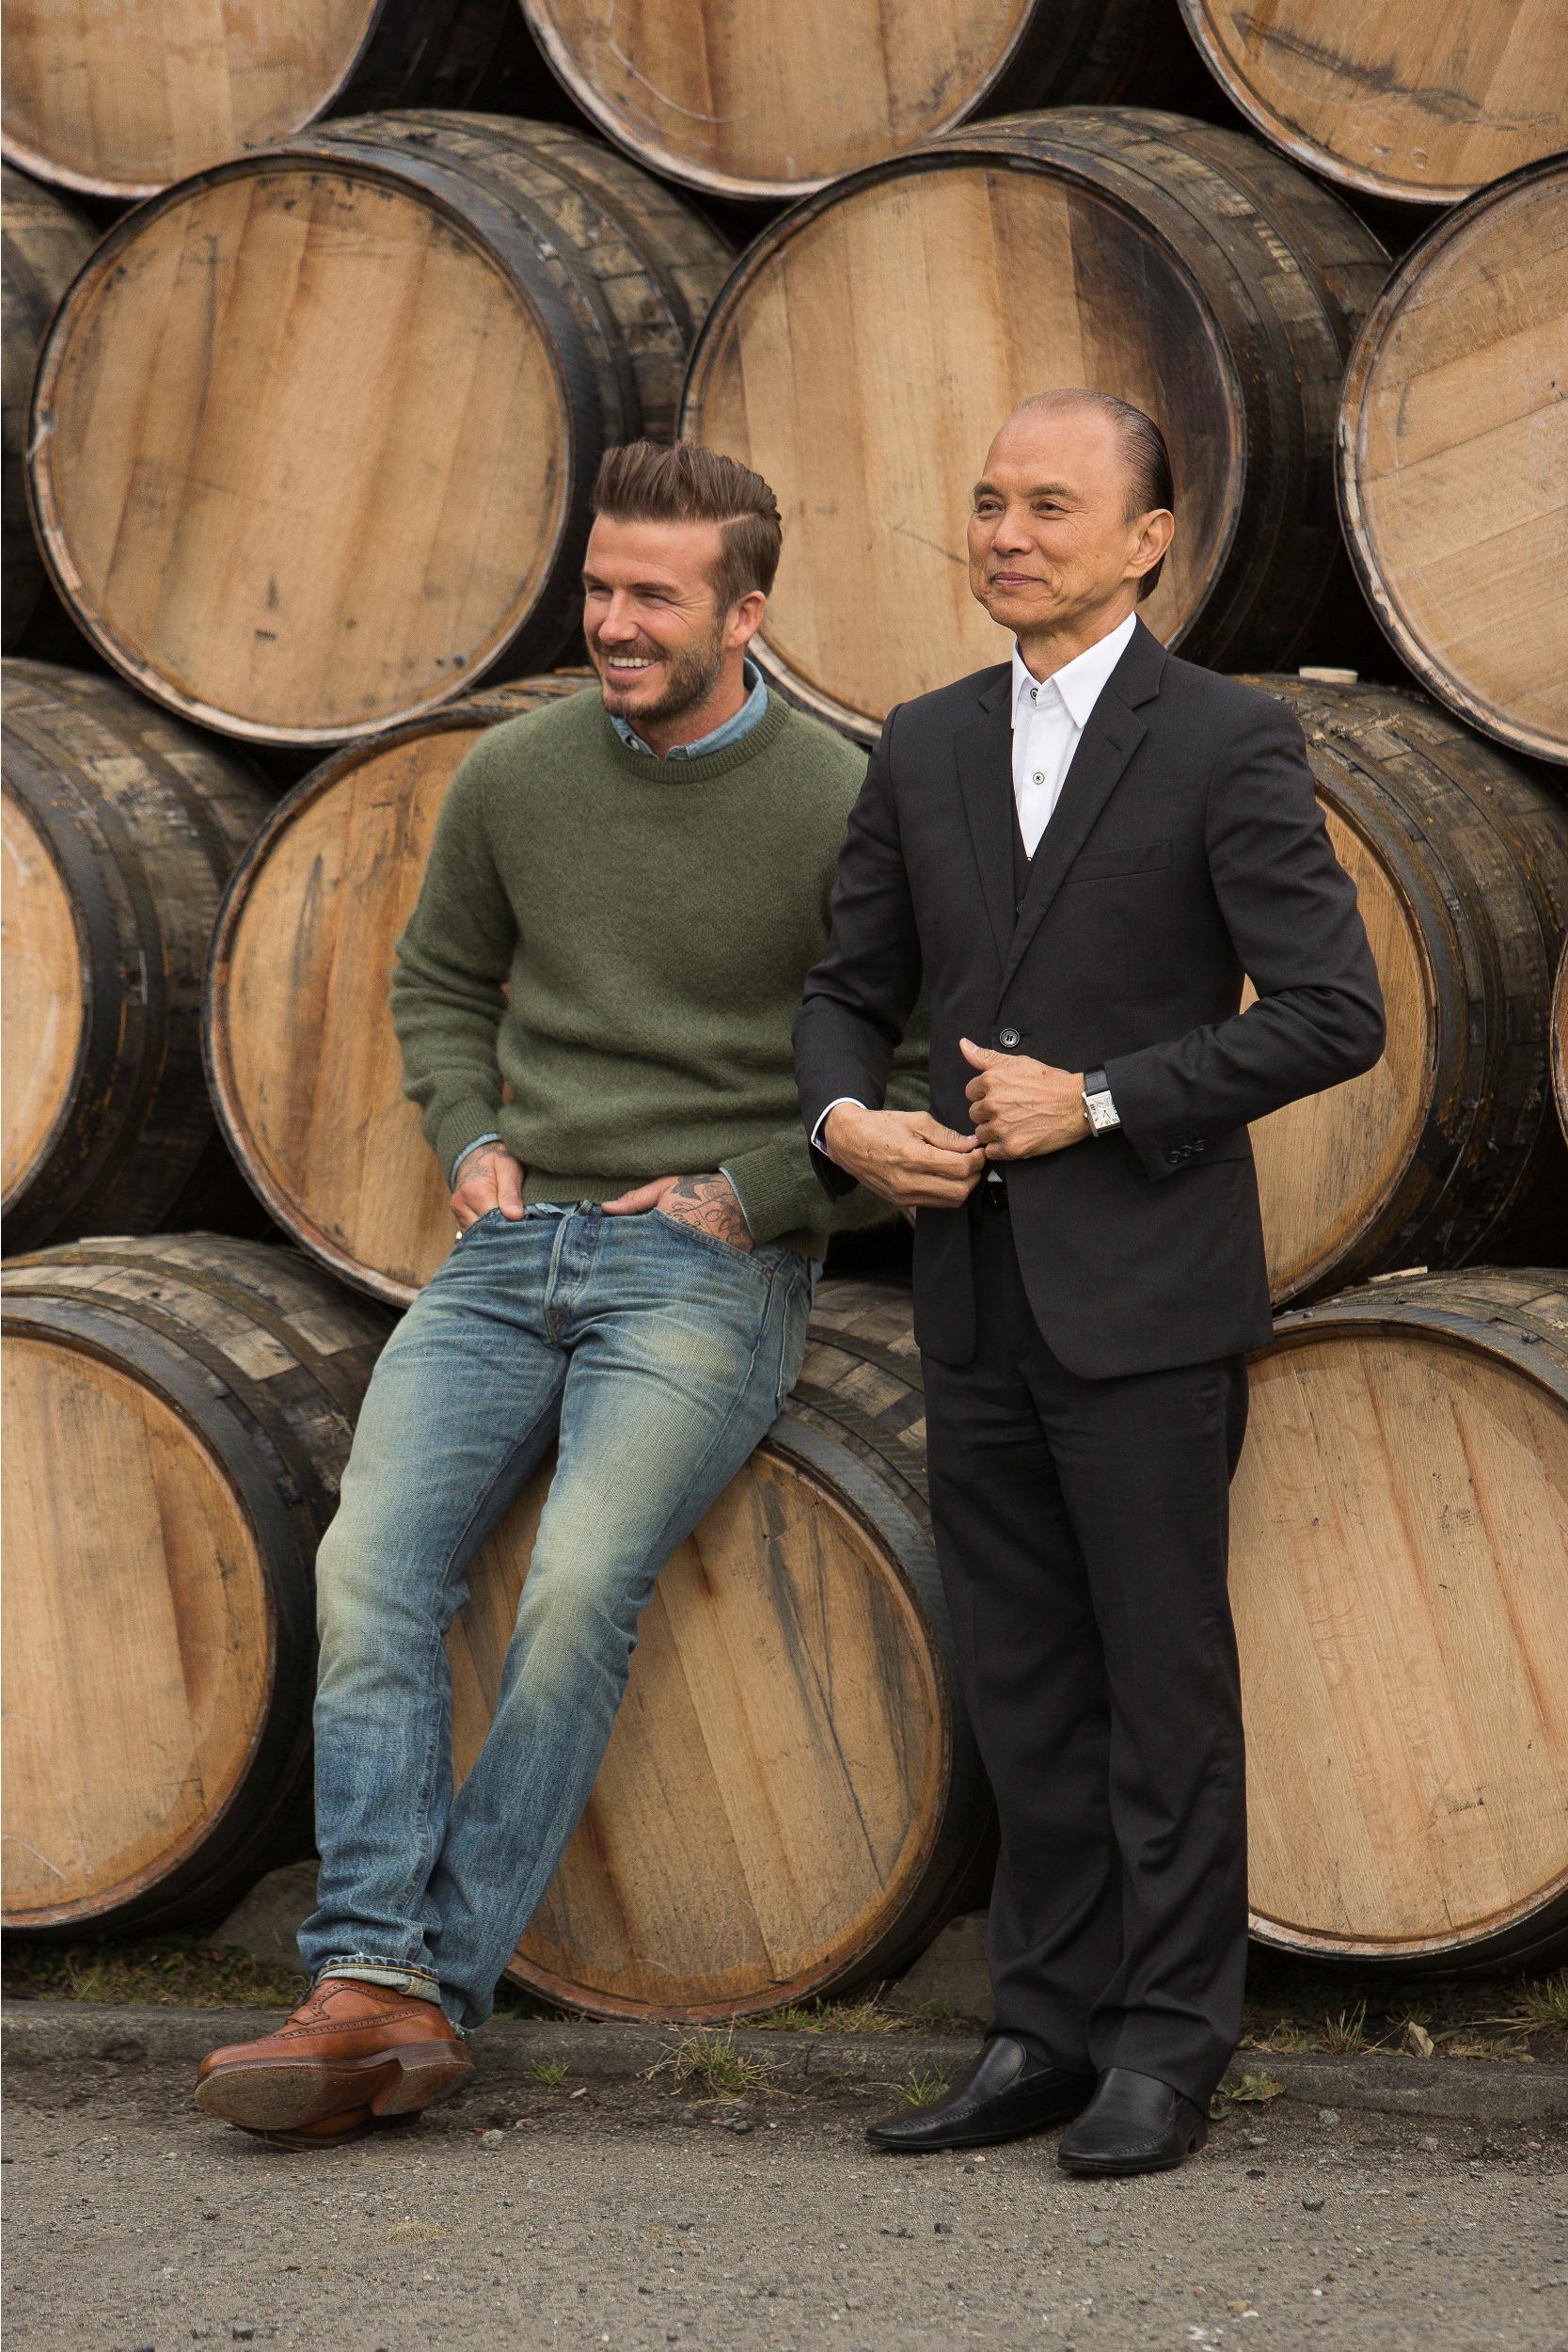 Aia To Host David Beckham Meet Greet In Kl This September